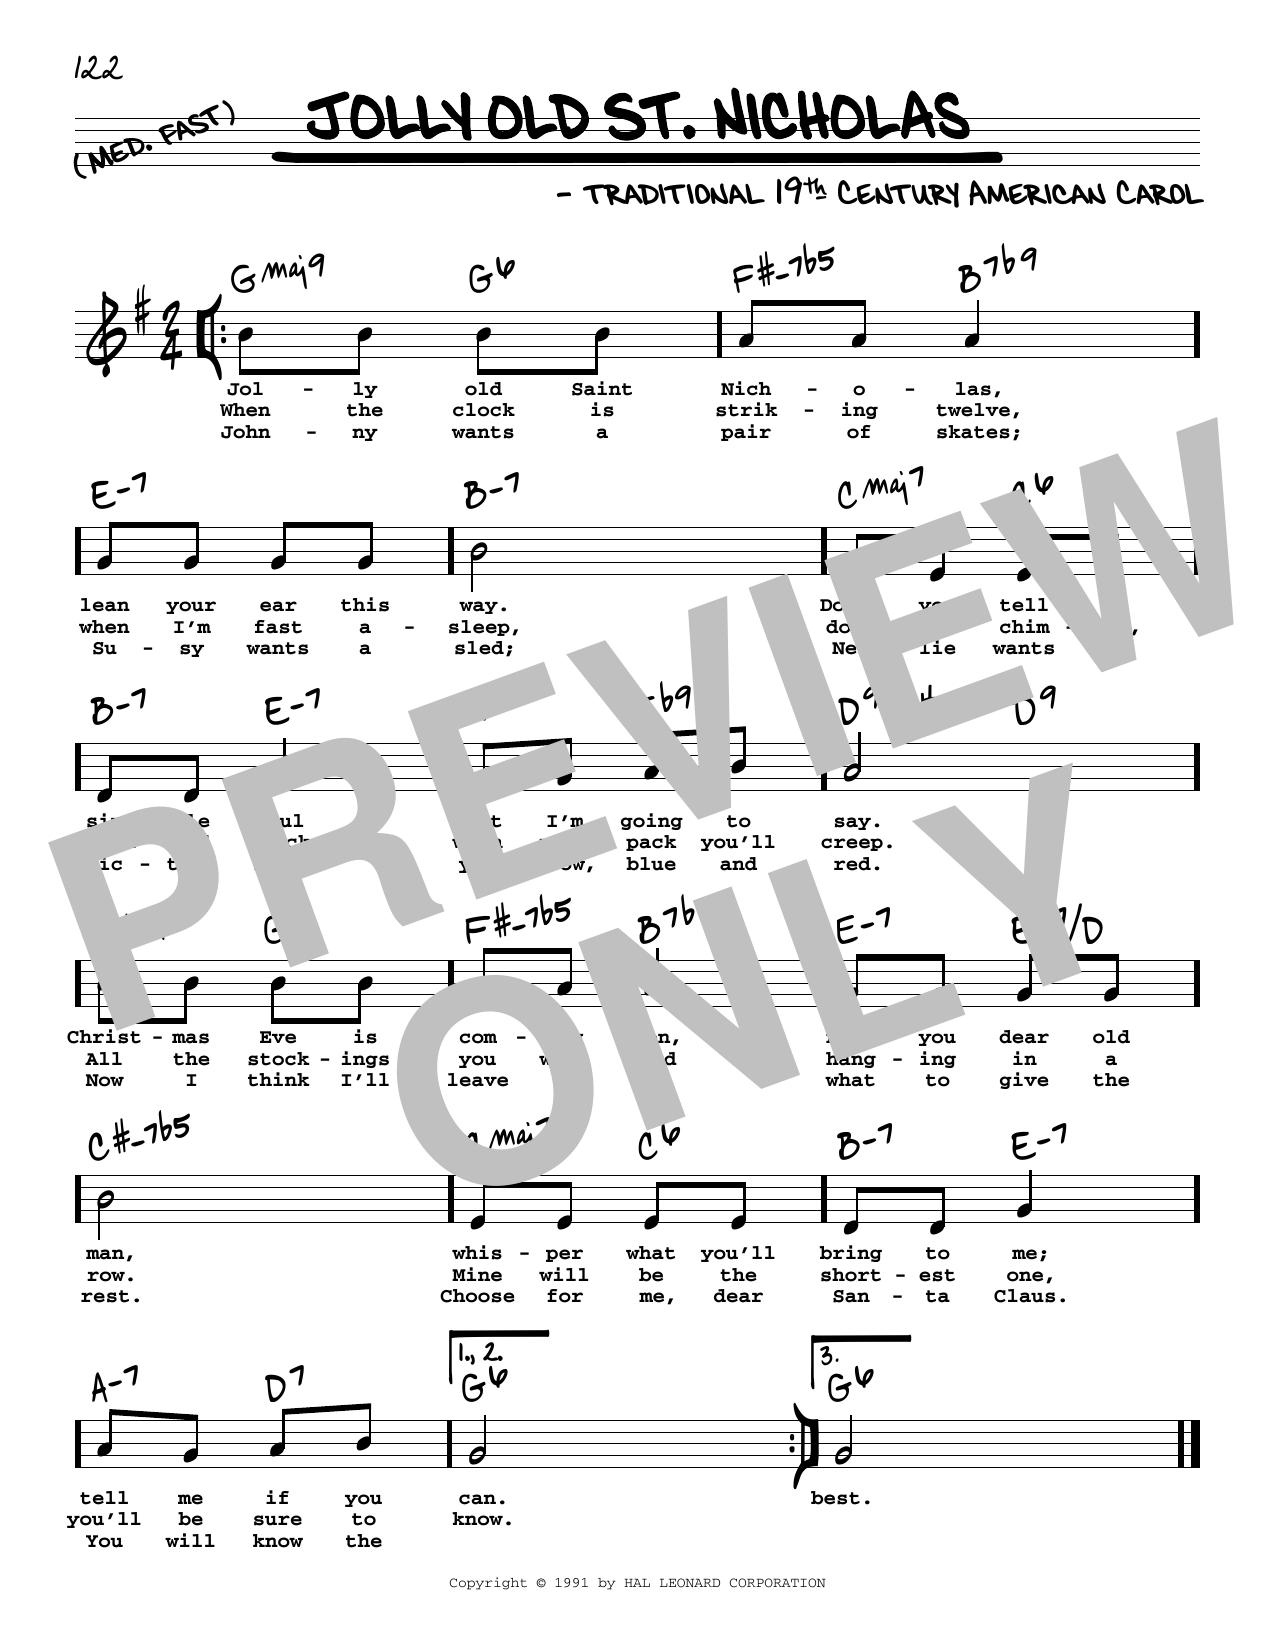 Jolly Old St. Nicholas Sheet Music